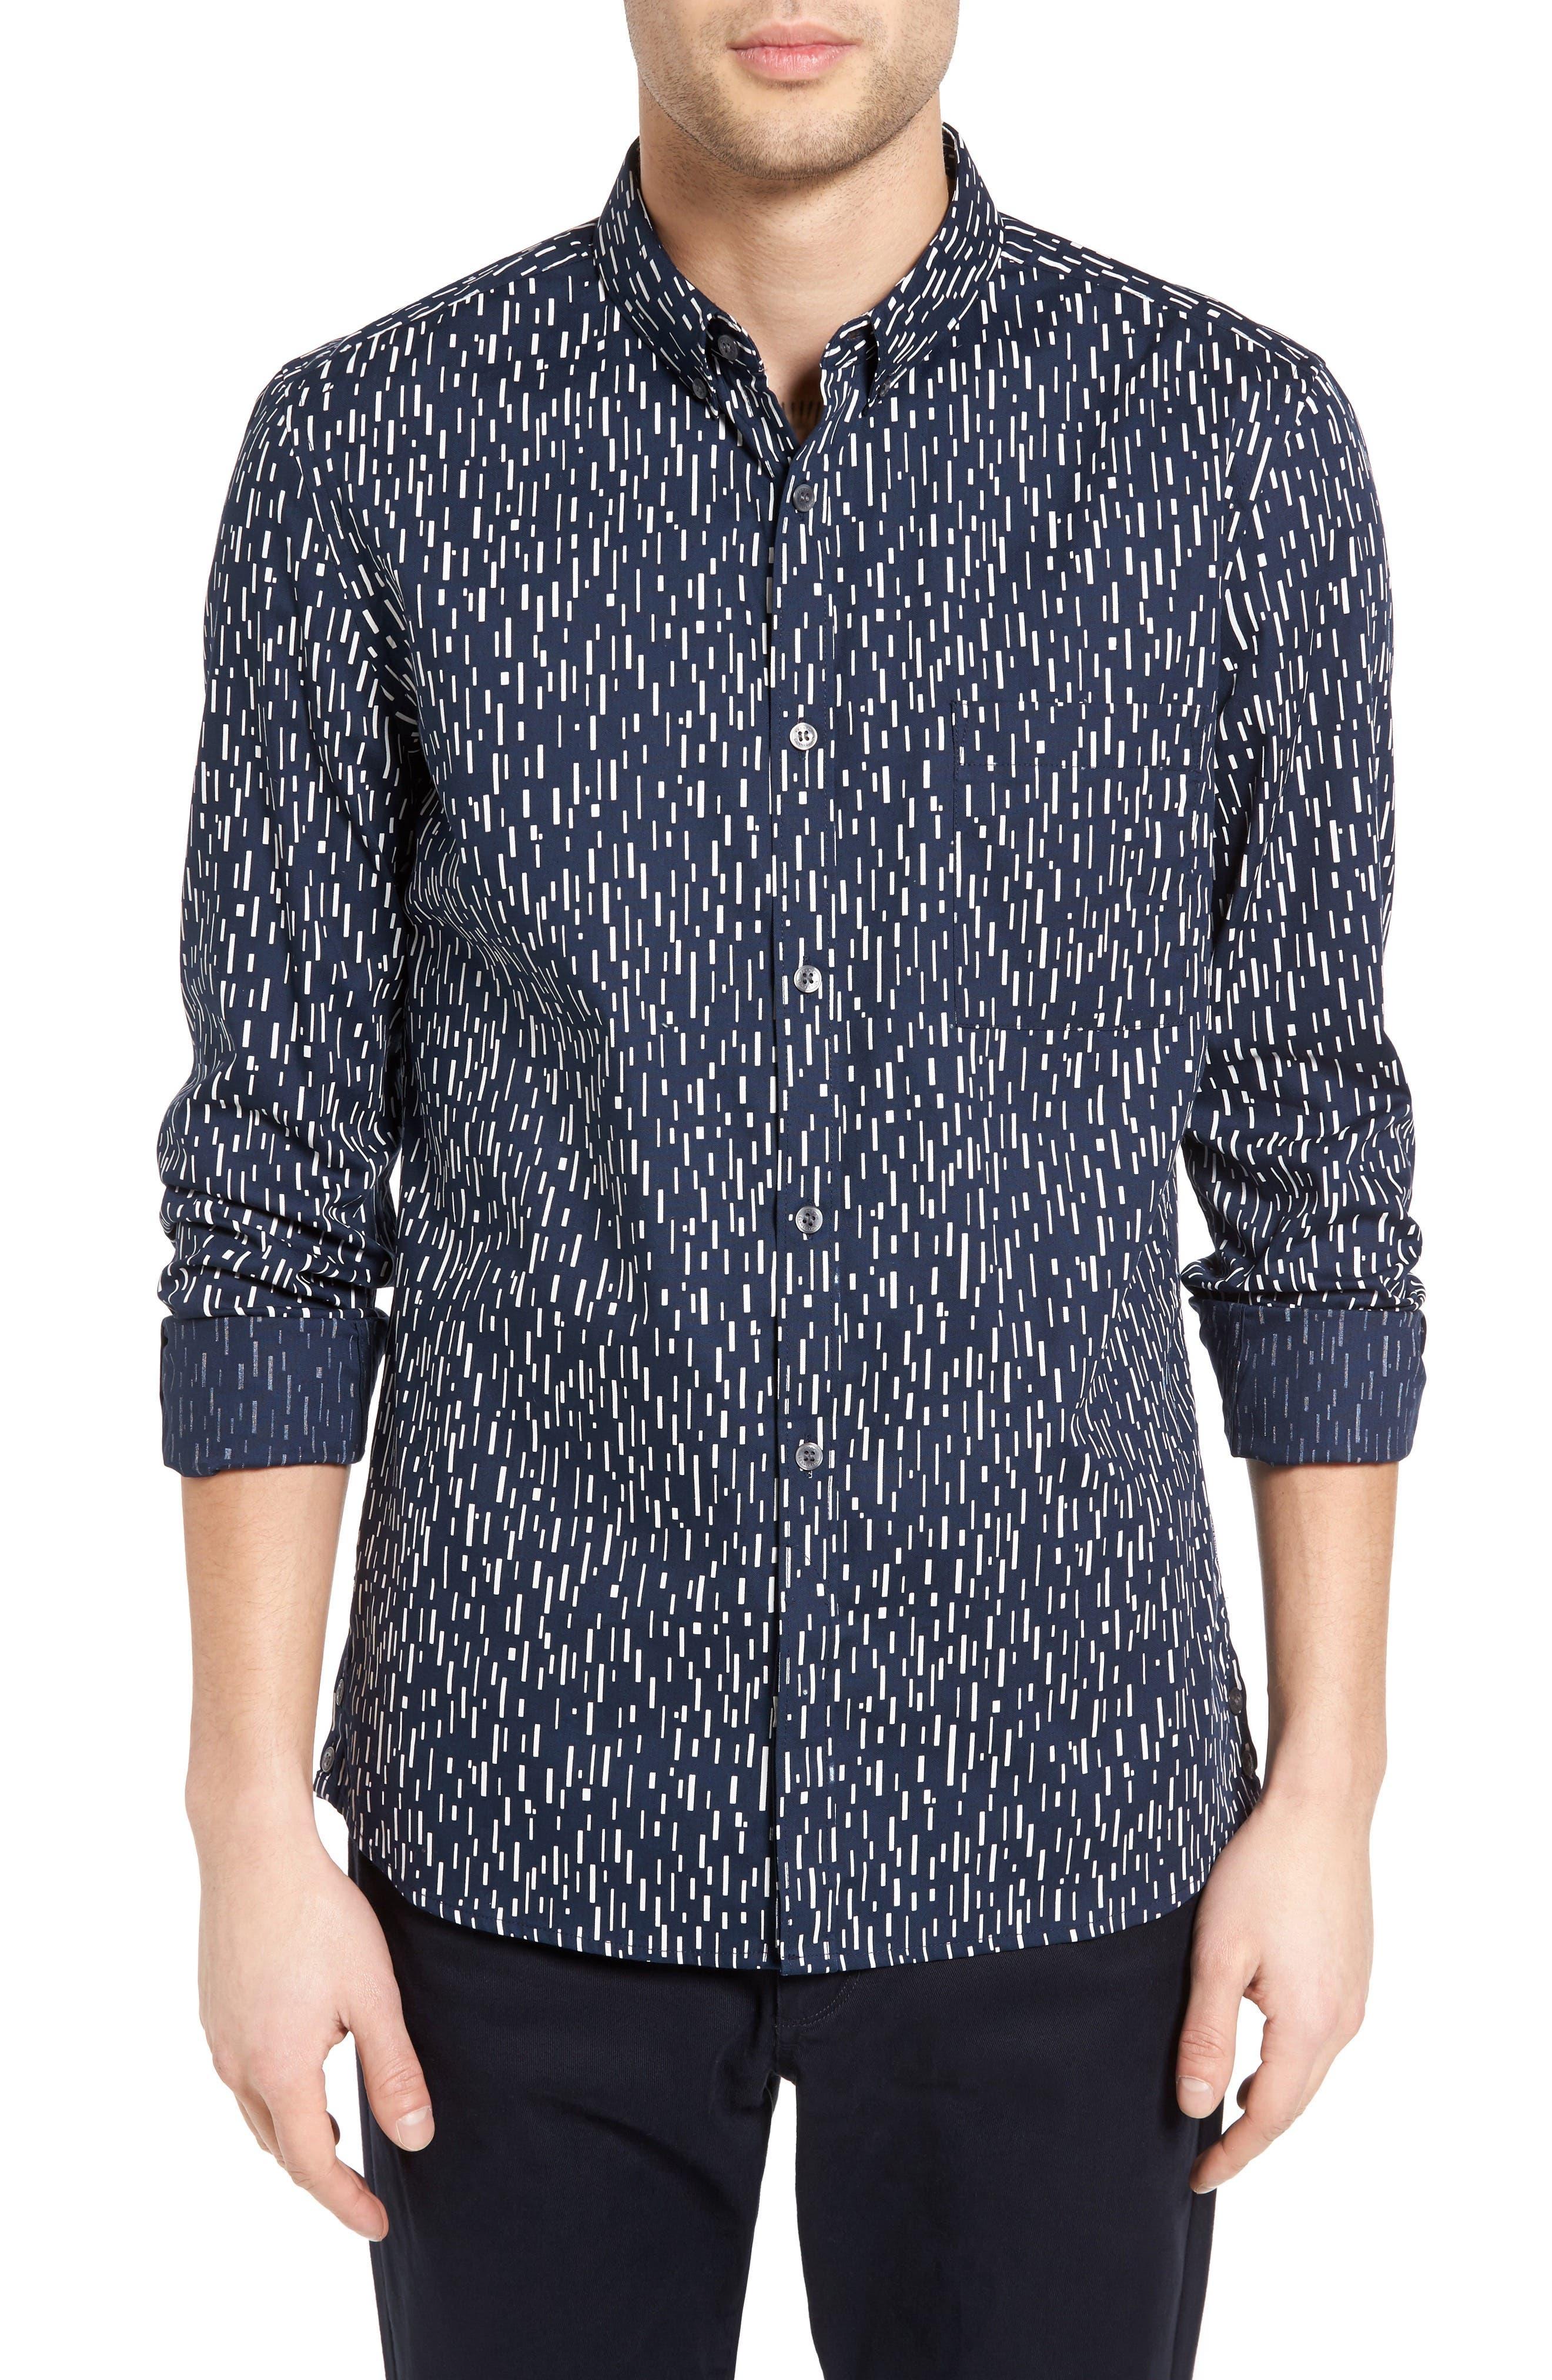 Main Image - French Connection Rain Dash Slim Fit Oxford Shirt